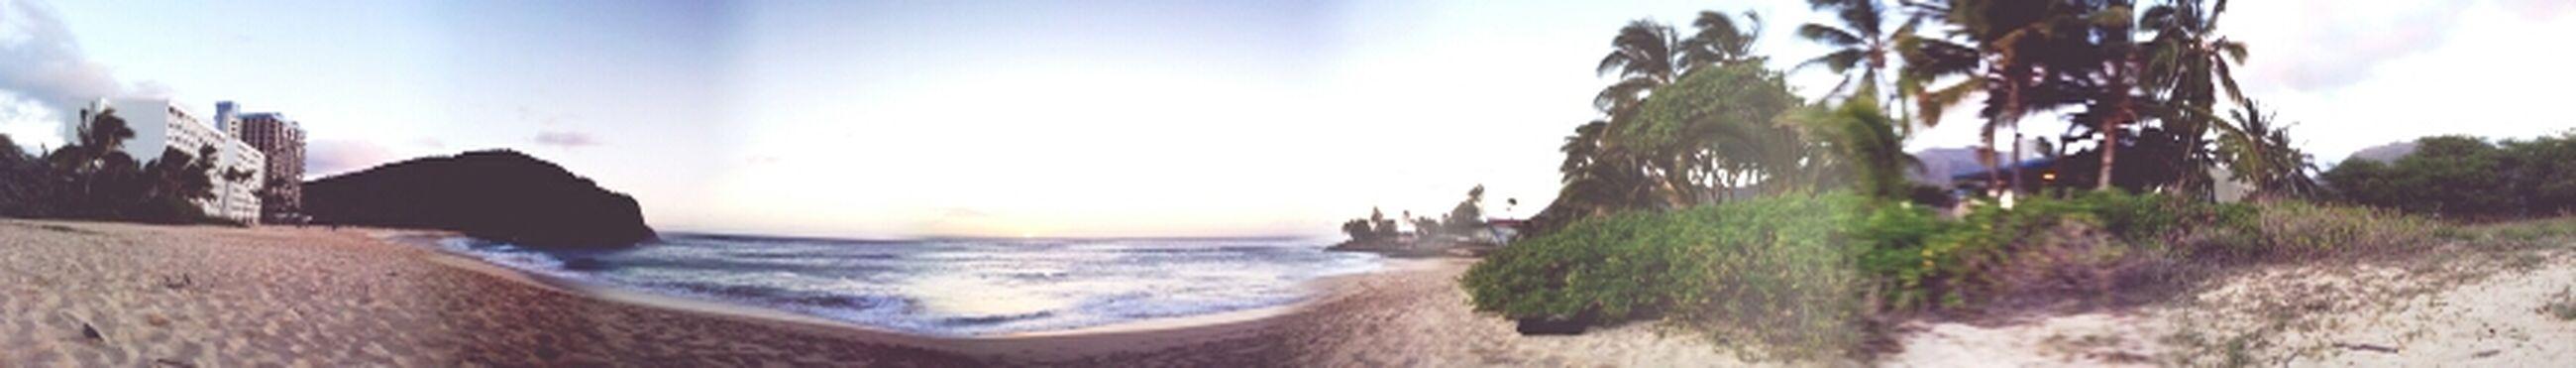 Hanging Out Beach Nature Beauty Beautiful Day Smoking Weed Hawaii Lucky We Live Hawaii Makaha  Cabannas